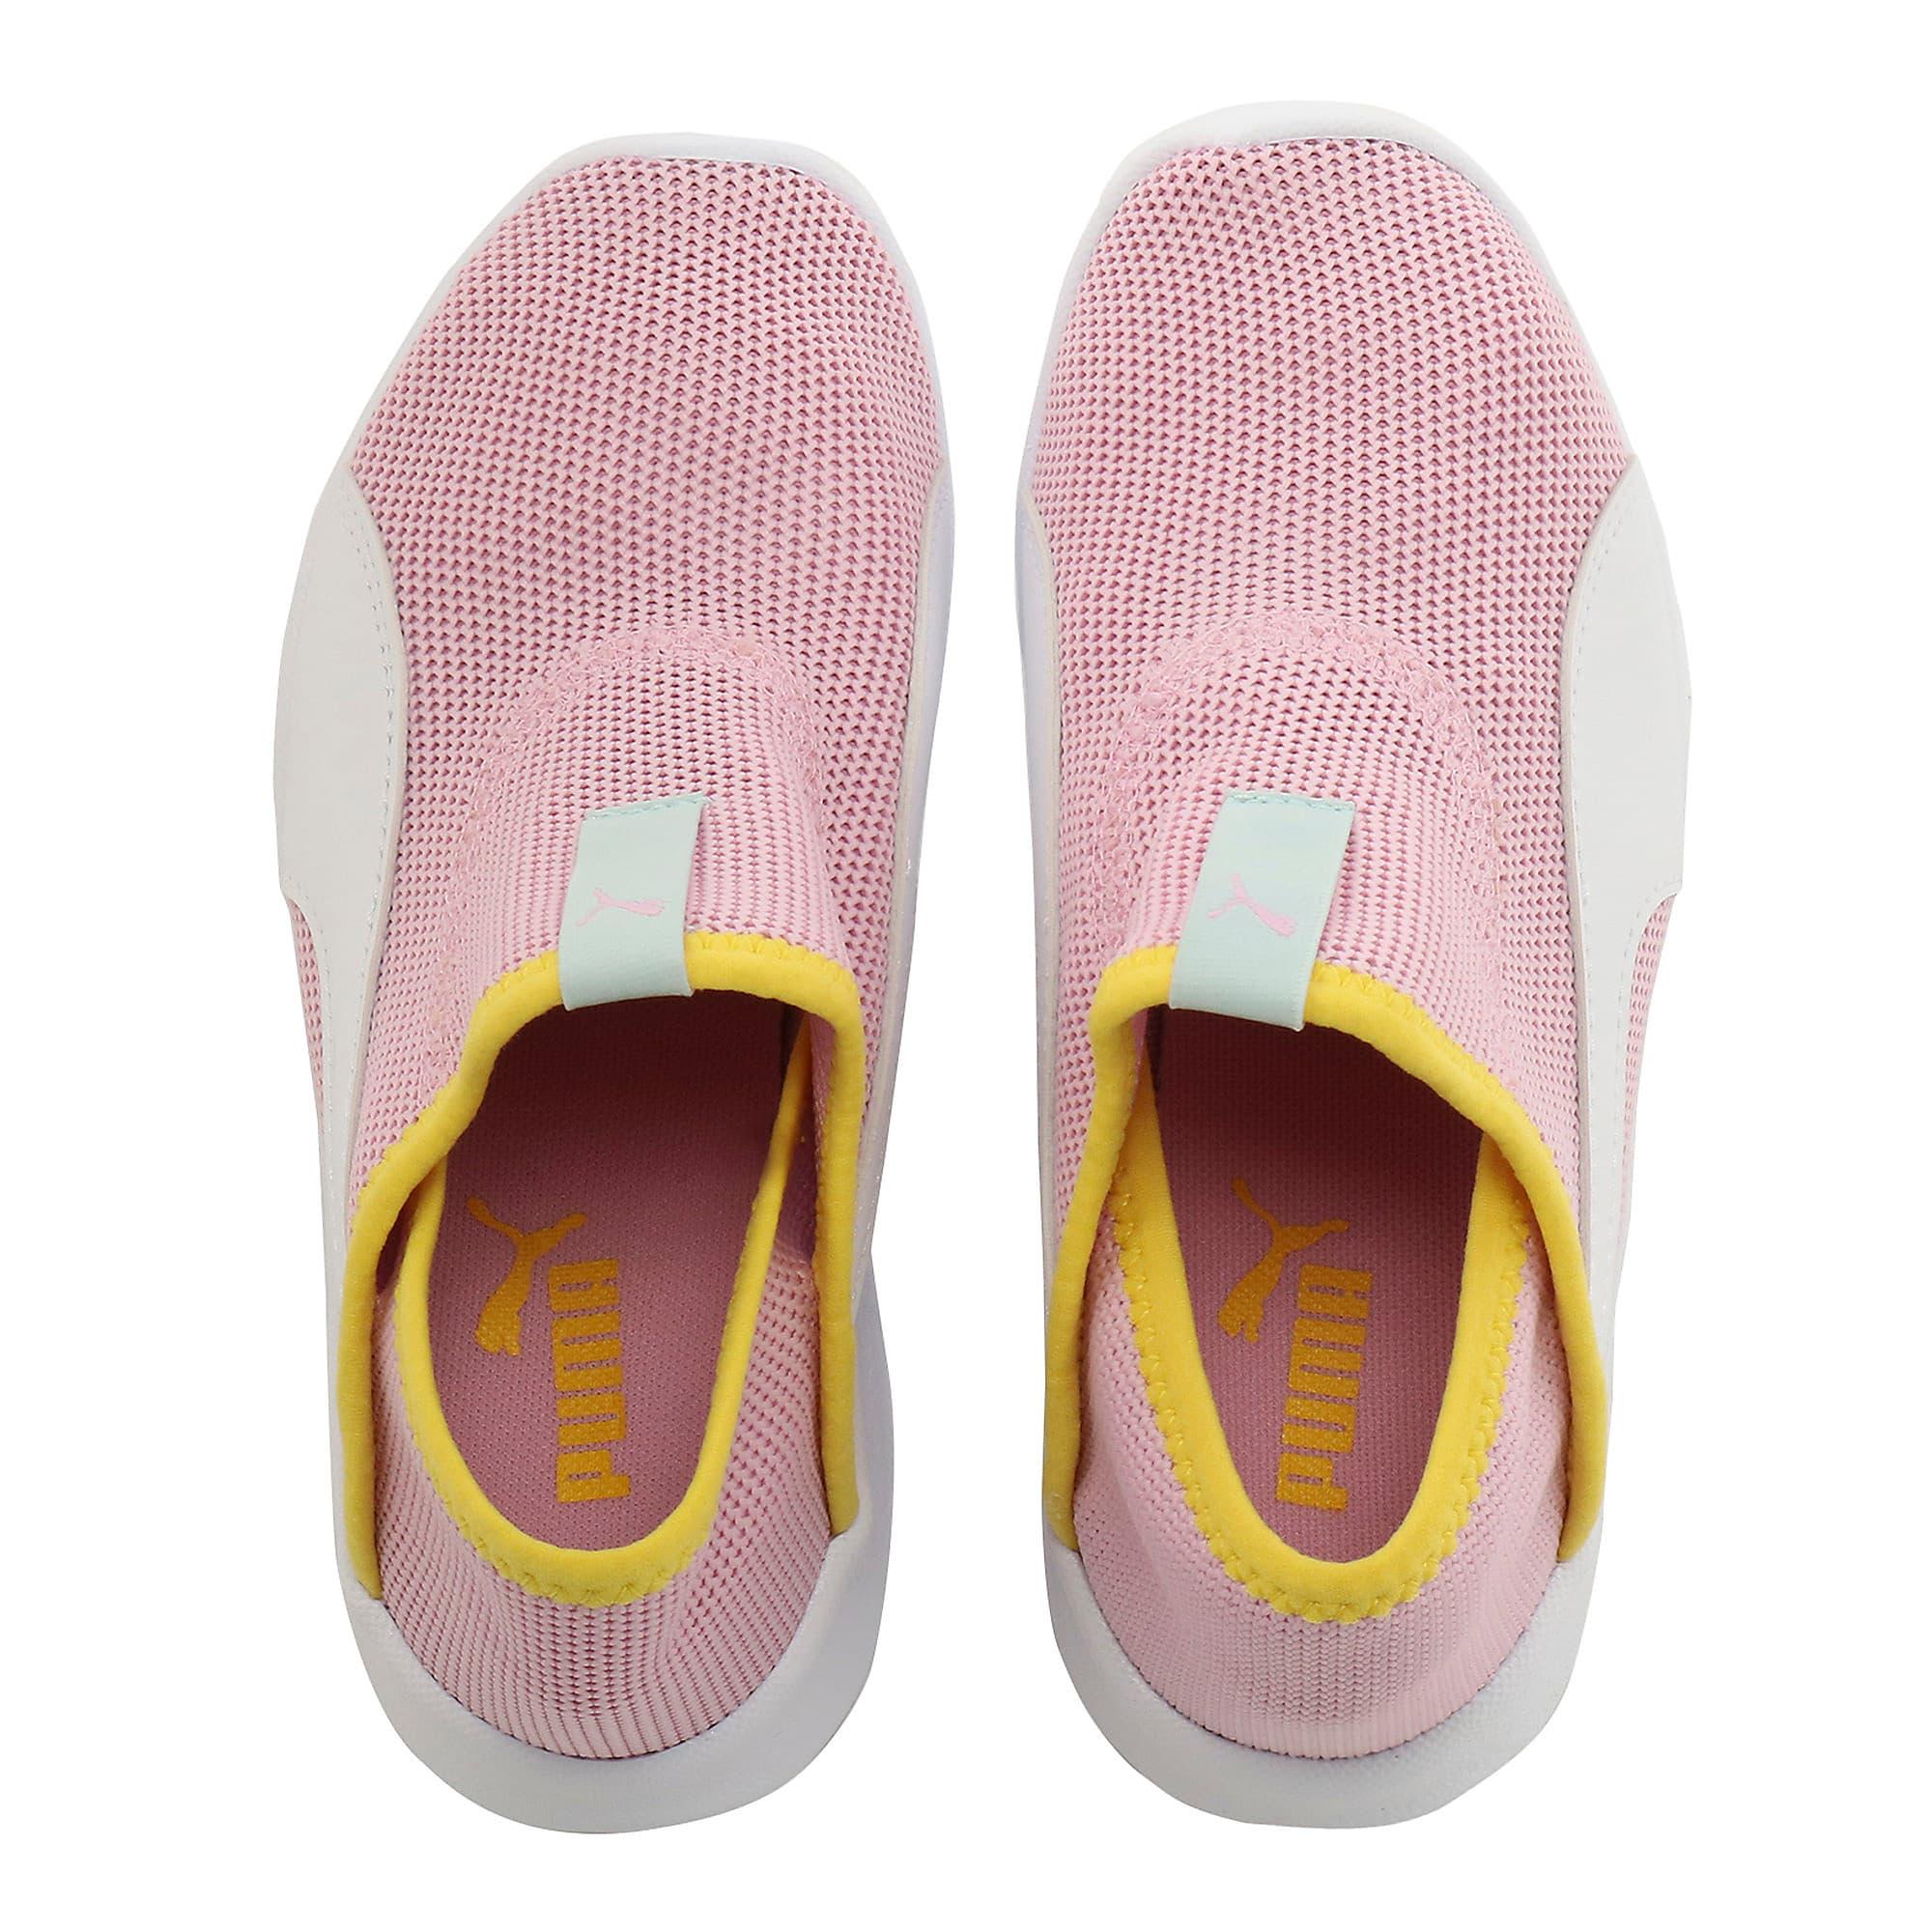 Thumbnail 6 of キッズ プーマ バオ 3 ソック PS 17-21cm, Pale Pink-White-Blazi Yellow, medium-JPN